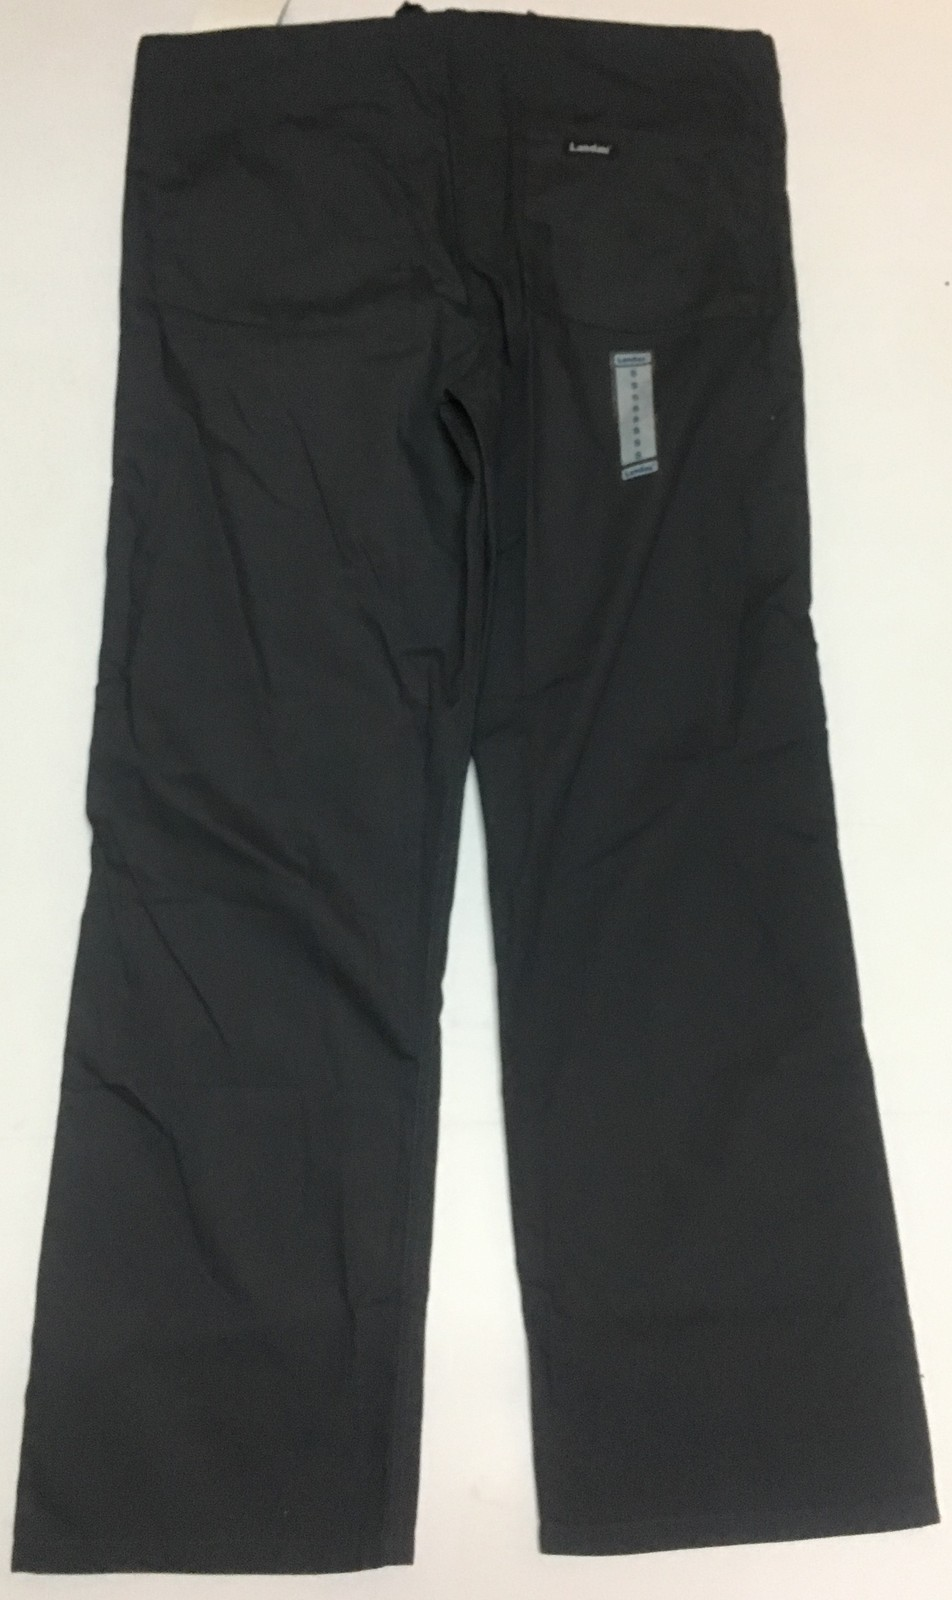 Landau Dark Gray Scrubs Pants NWT Sz Small